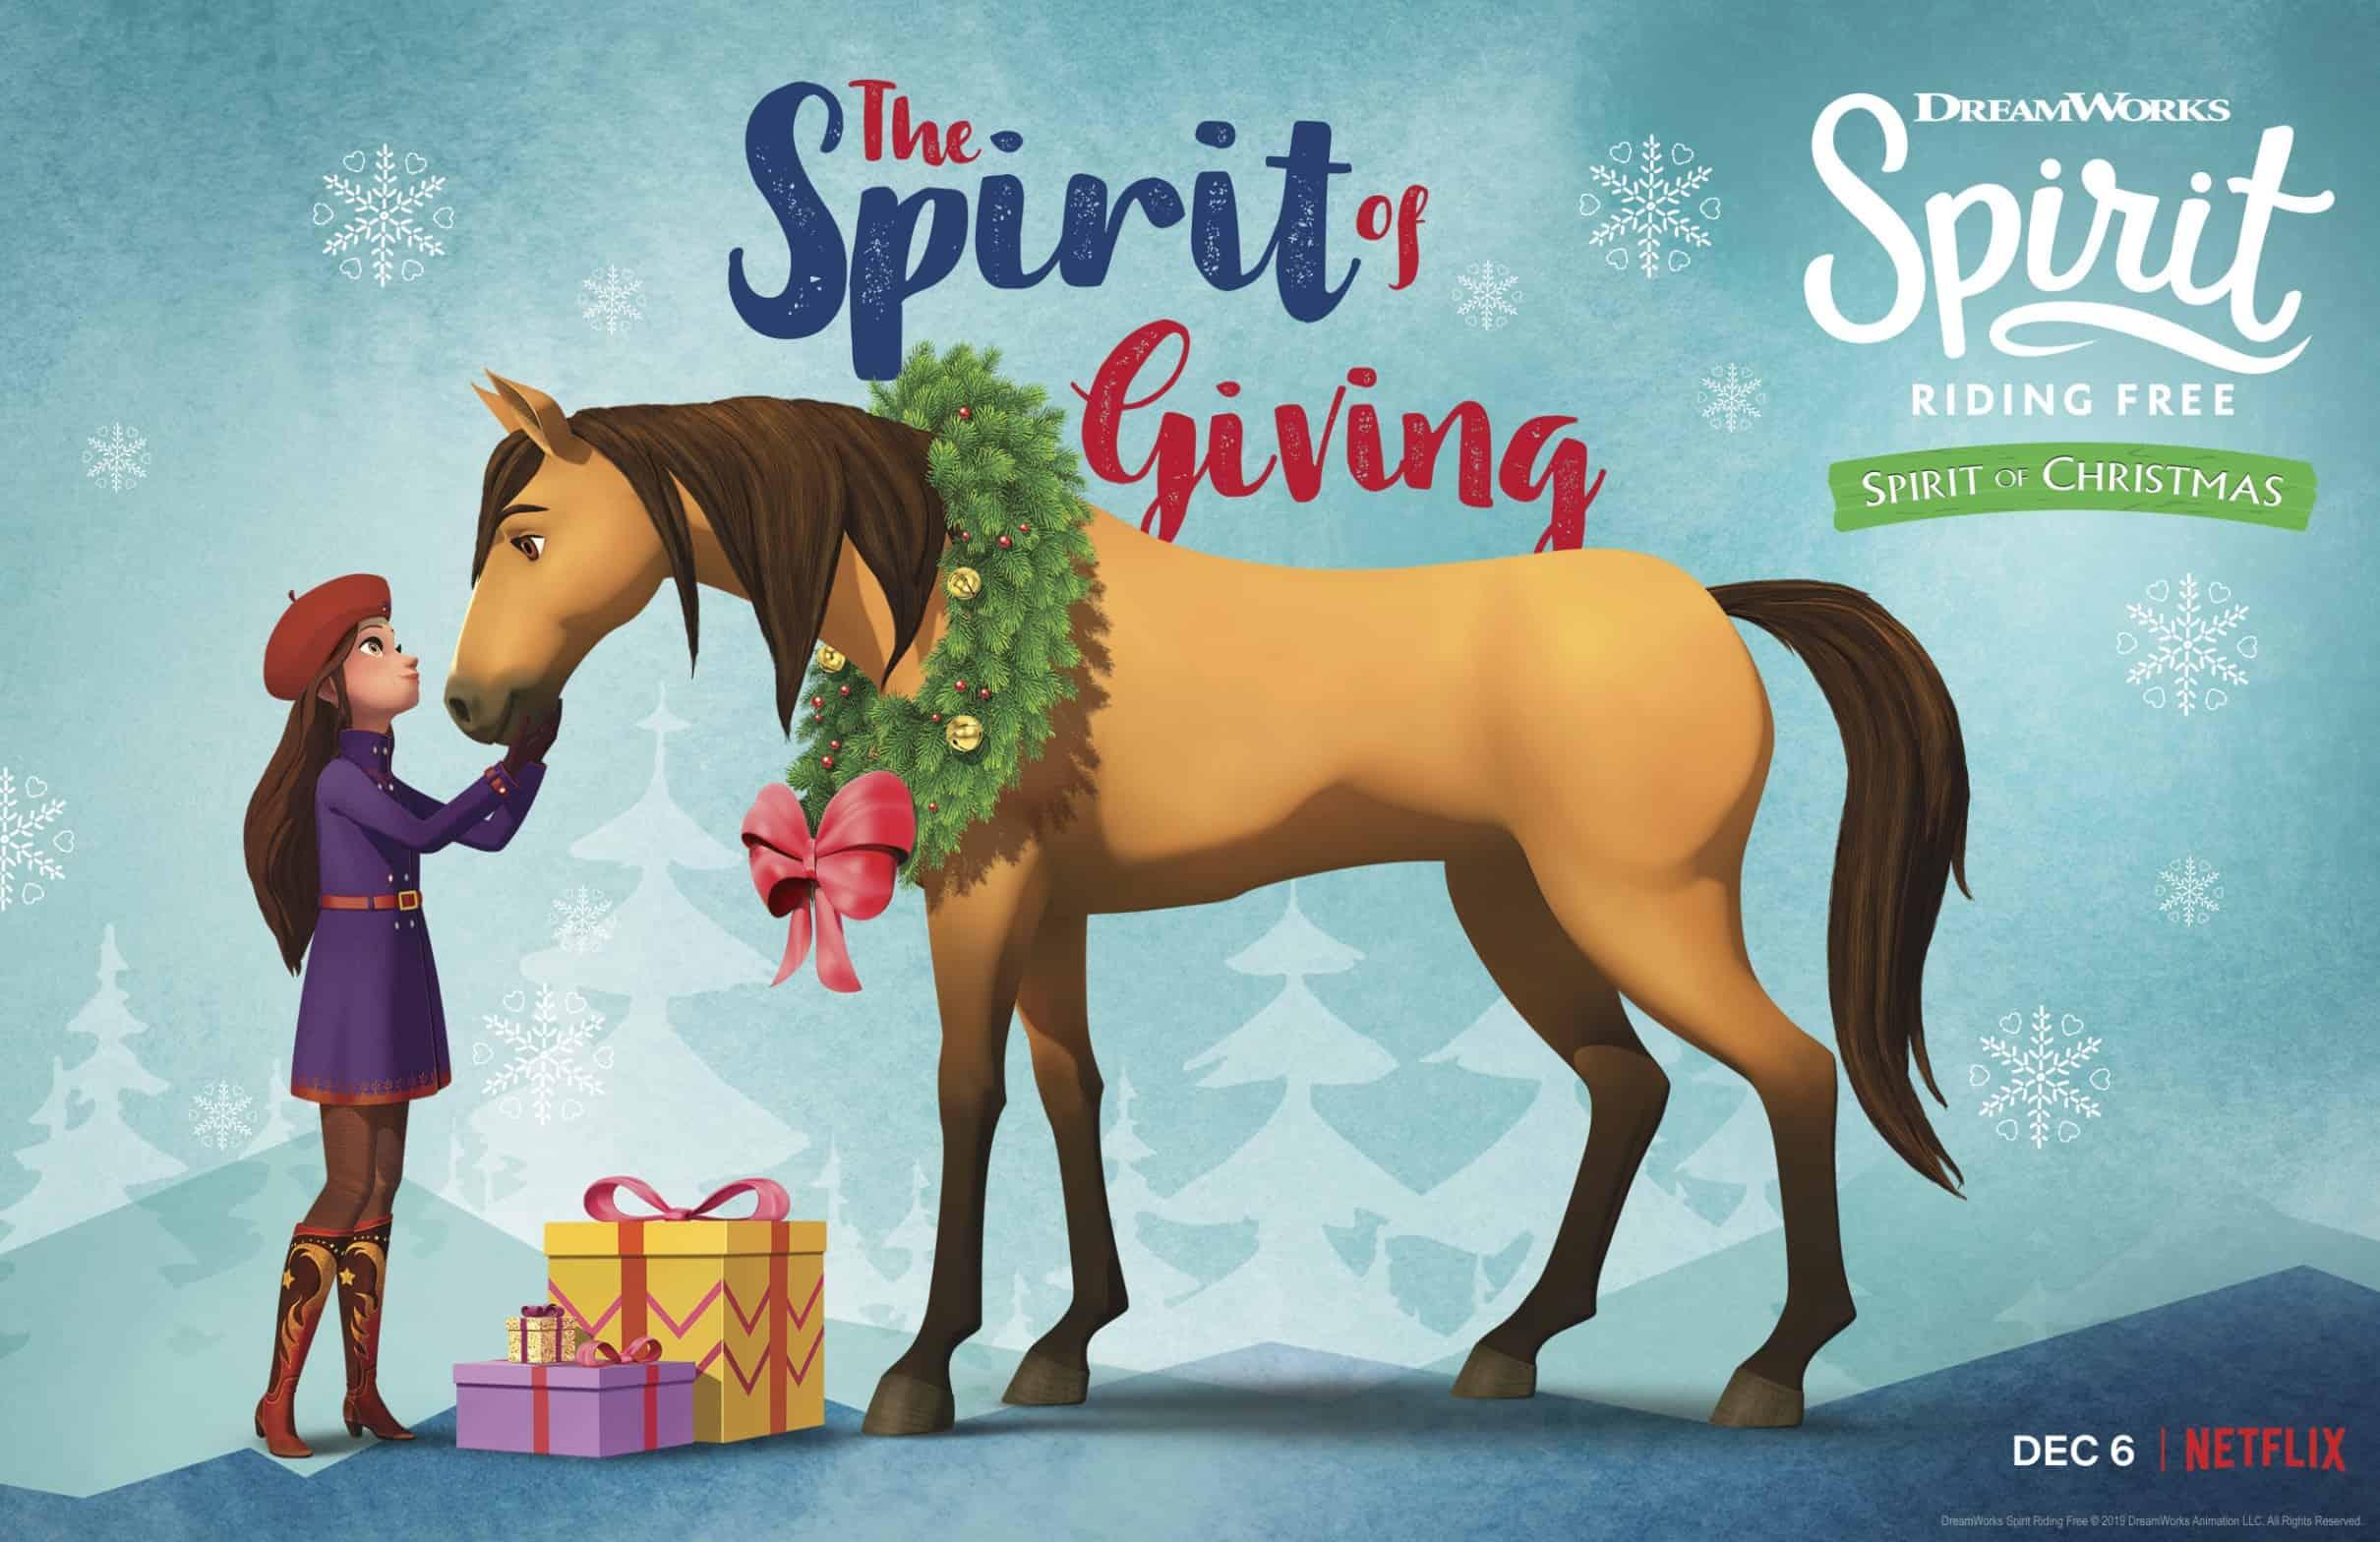 Spirit Christmas show Netflix DreamWorks